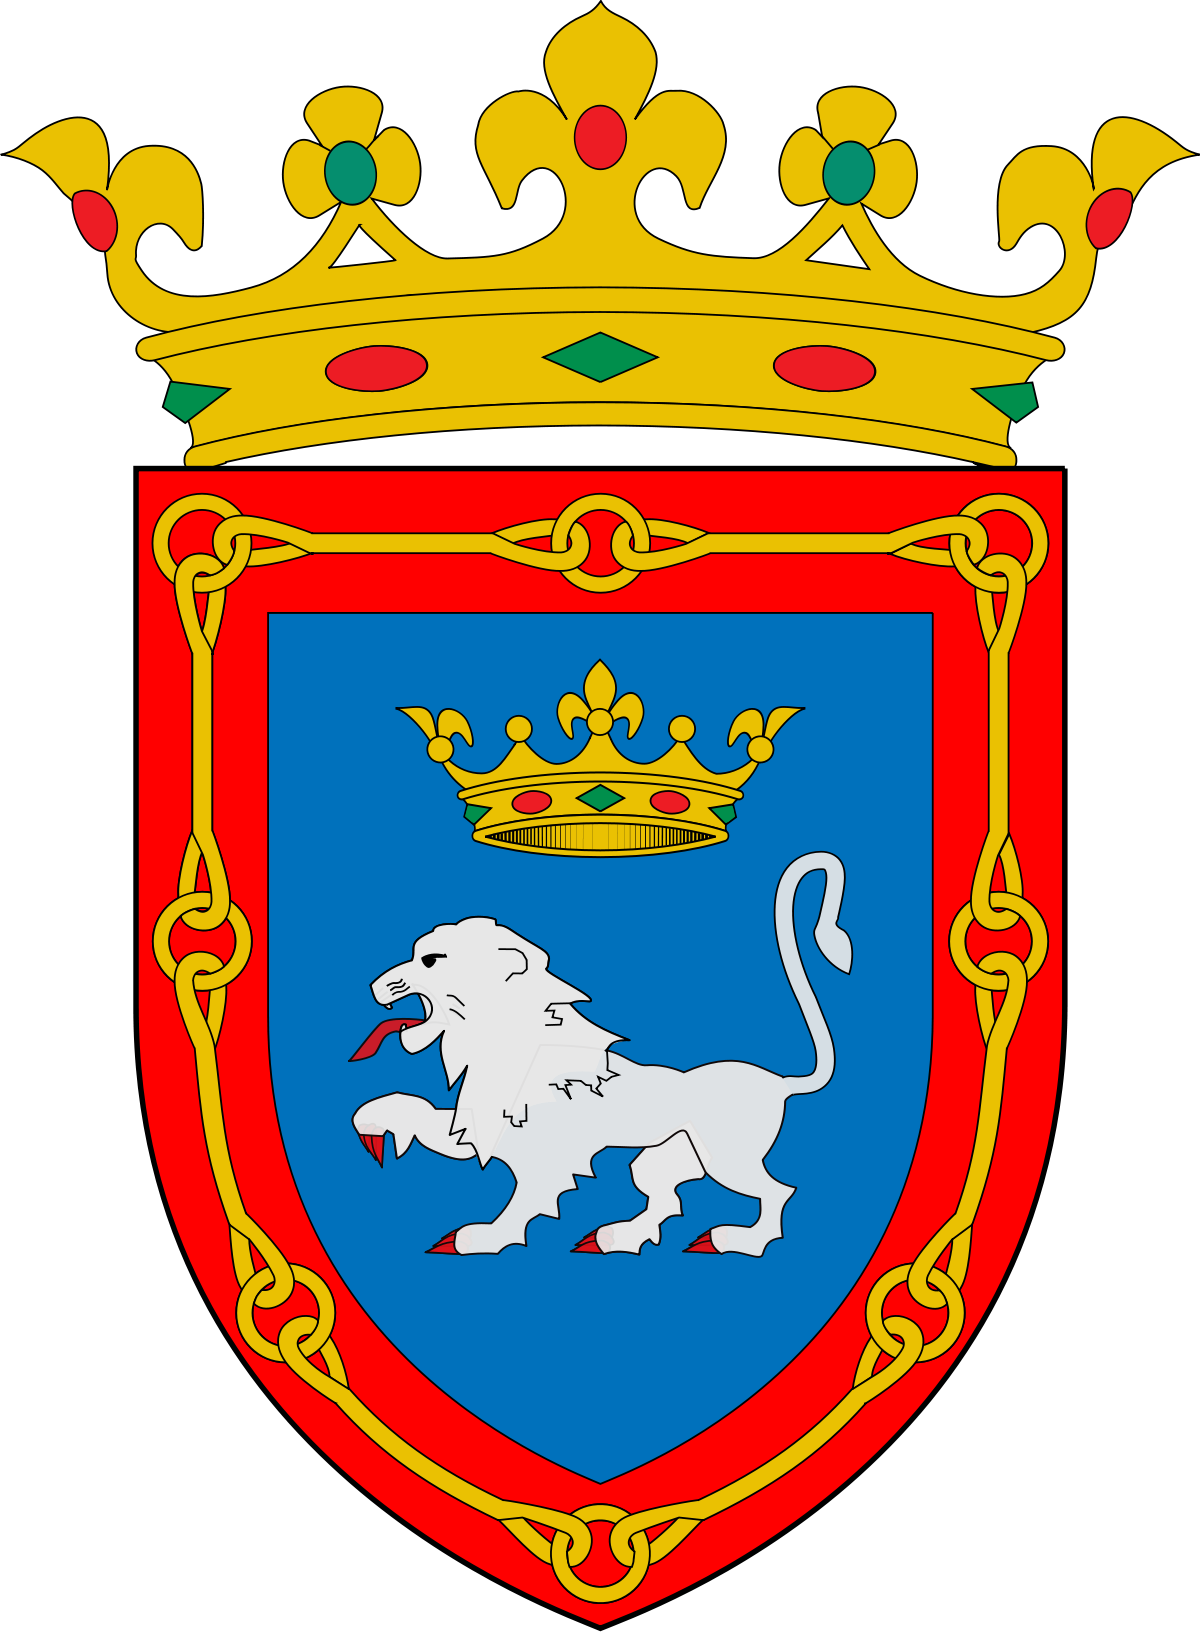 Legislación municipal en materia animal de Navarra para Pamplona